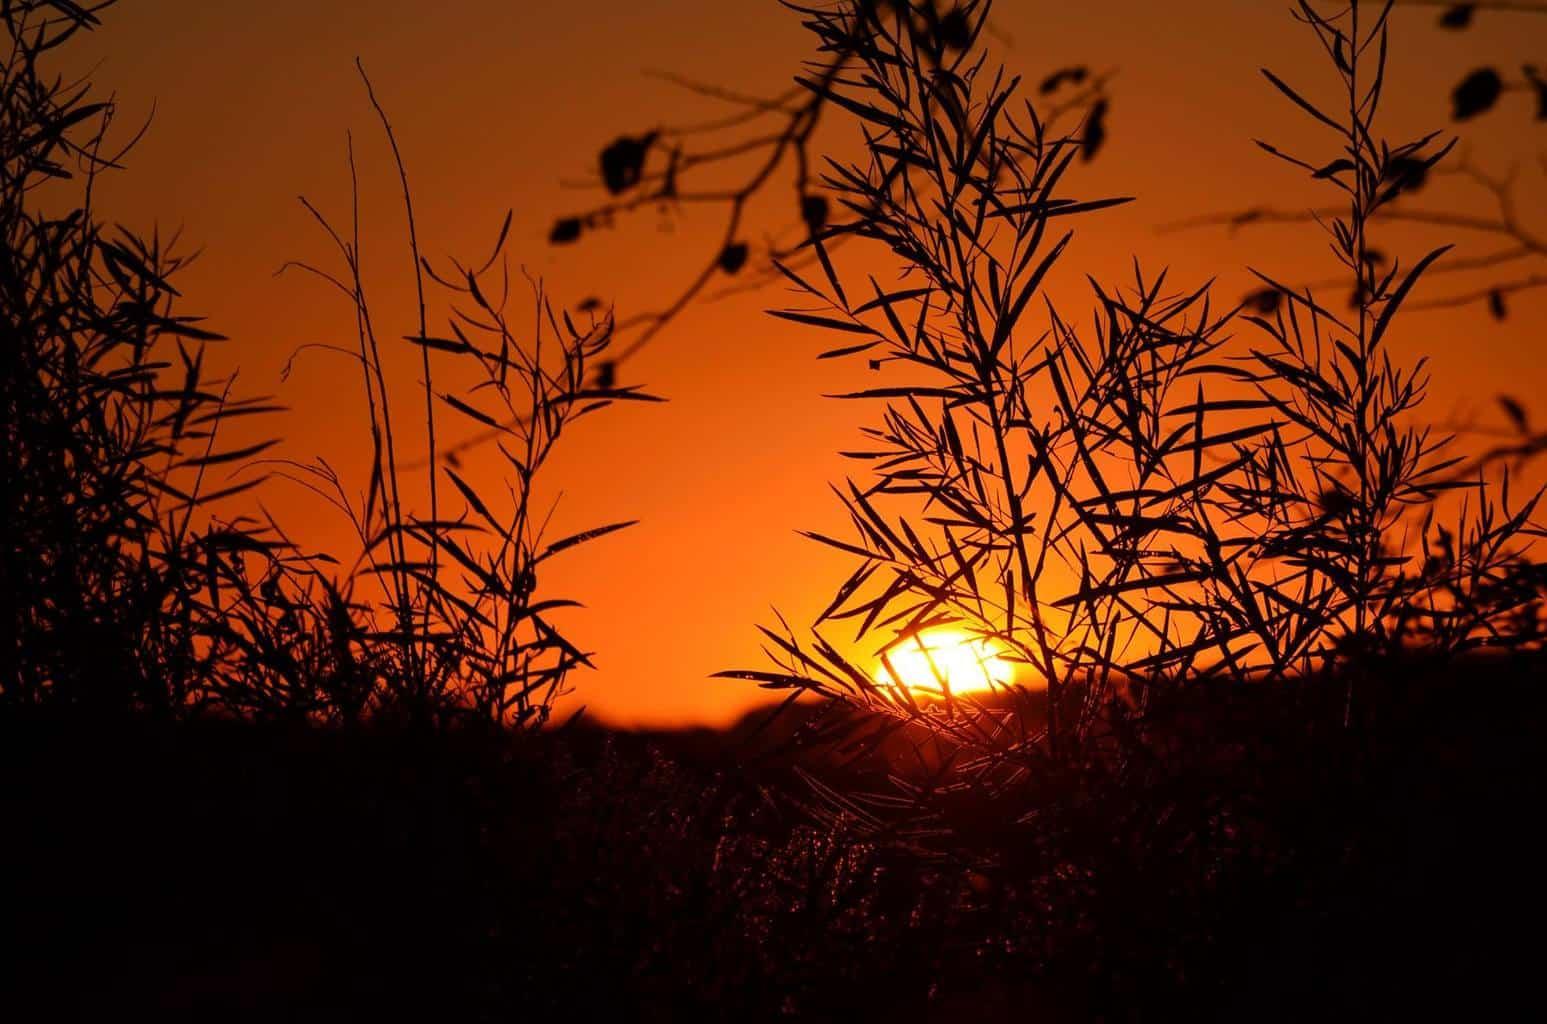 sunset Ste. Genevieve Co. Missouri